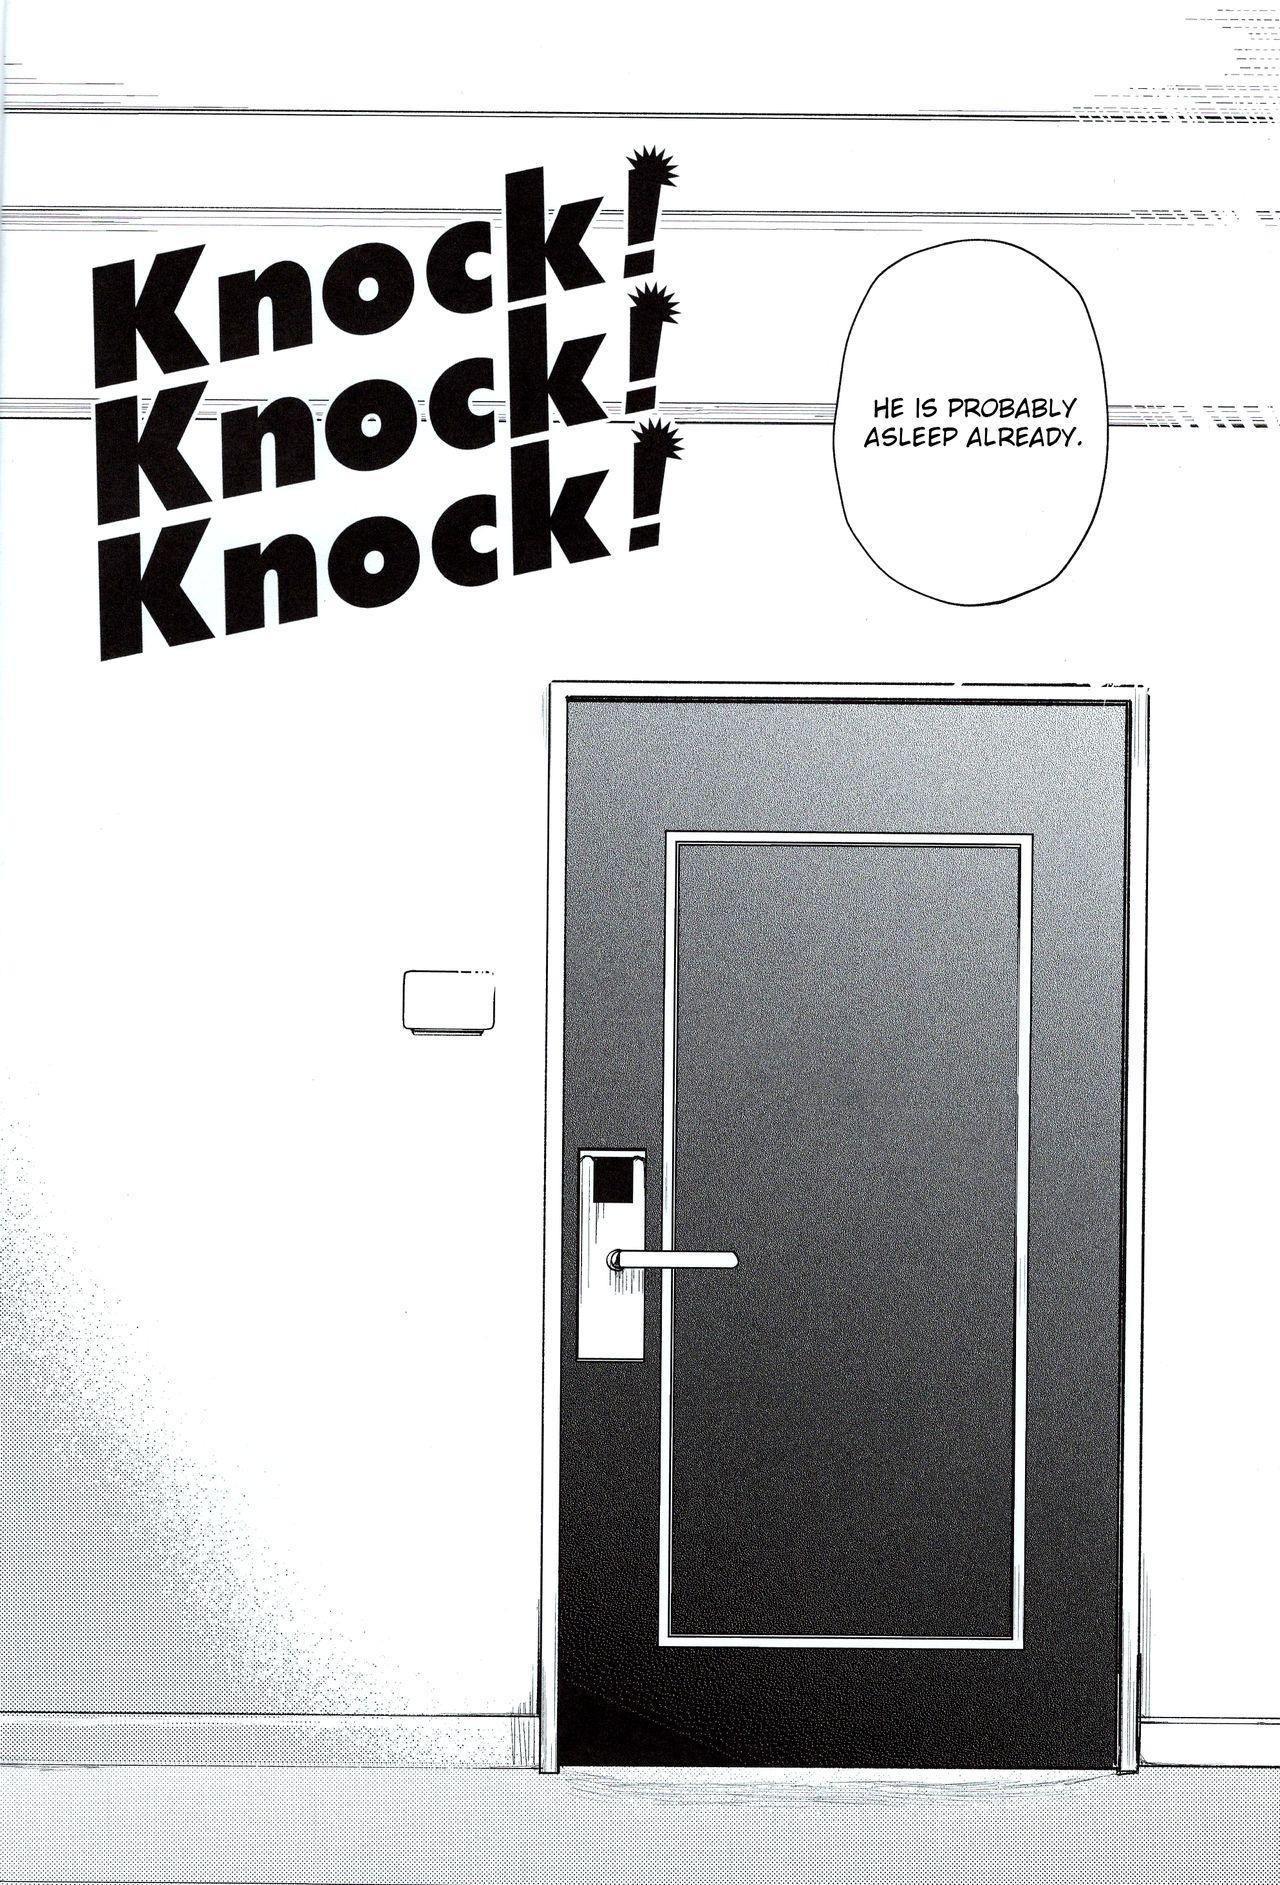 Knock! Knock! Knock! 3